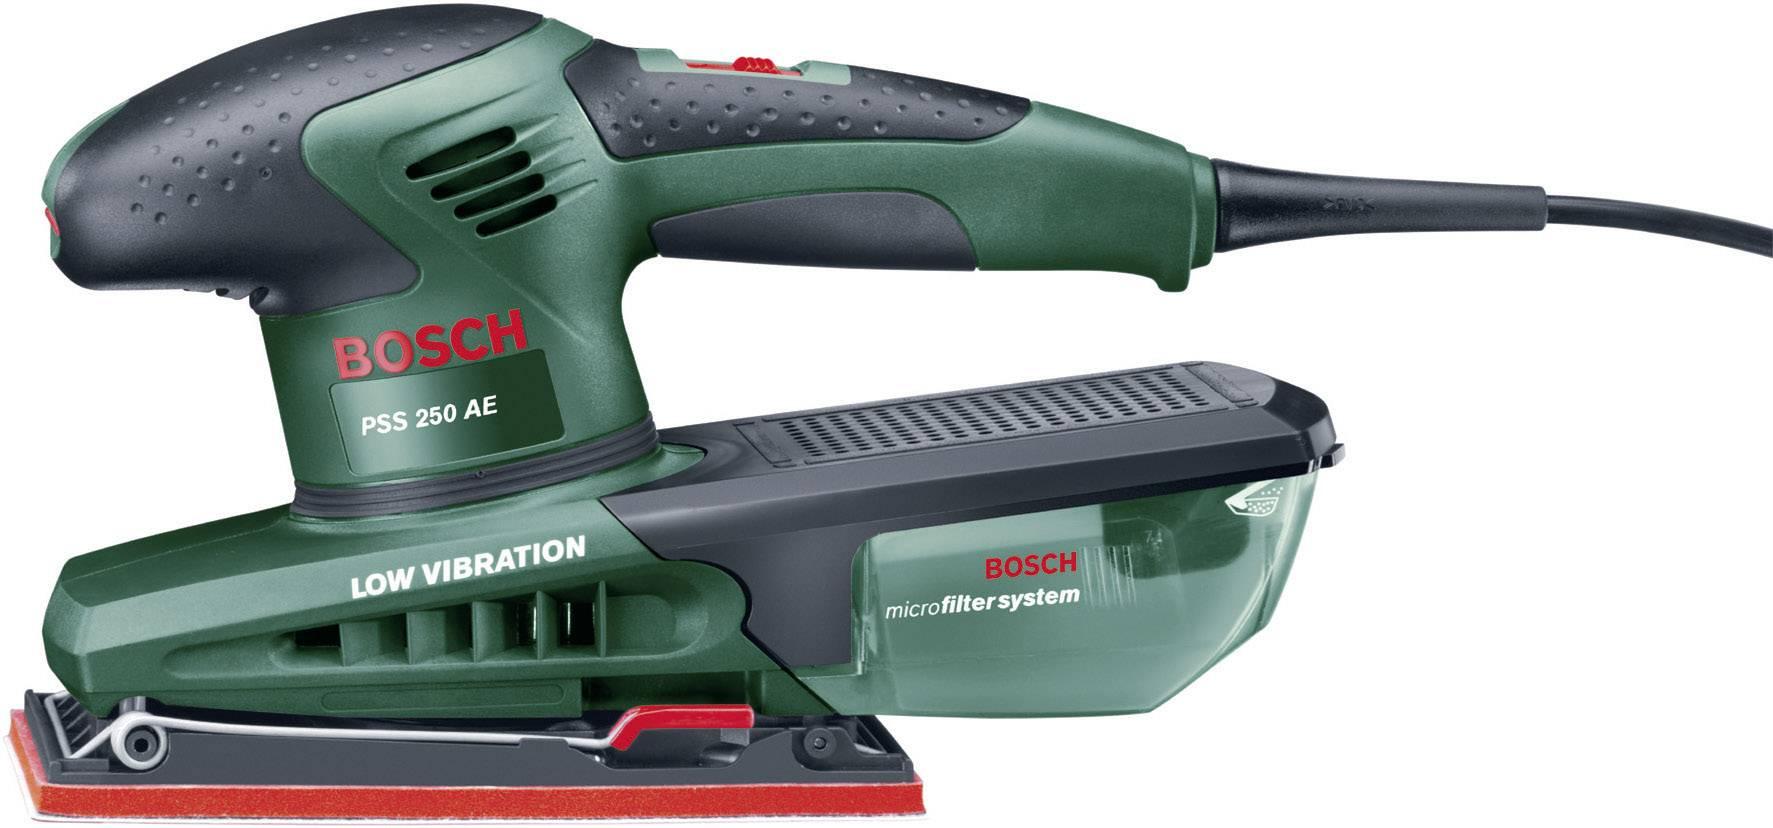 Voorkeur Bosch Home and Garden PSS 250 AE Vlakschuurmachine | Conrad.be OF04